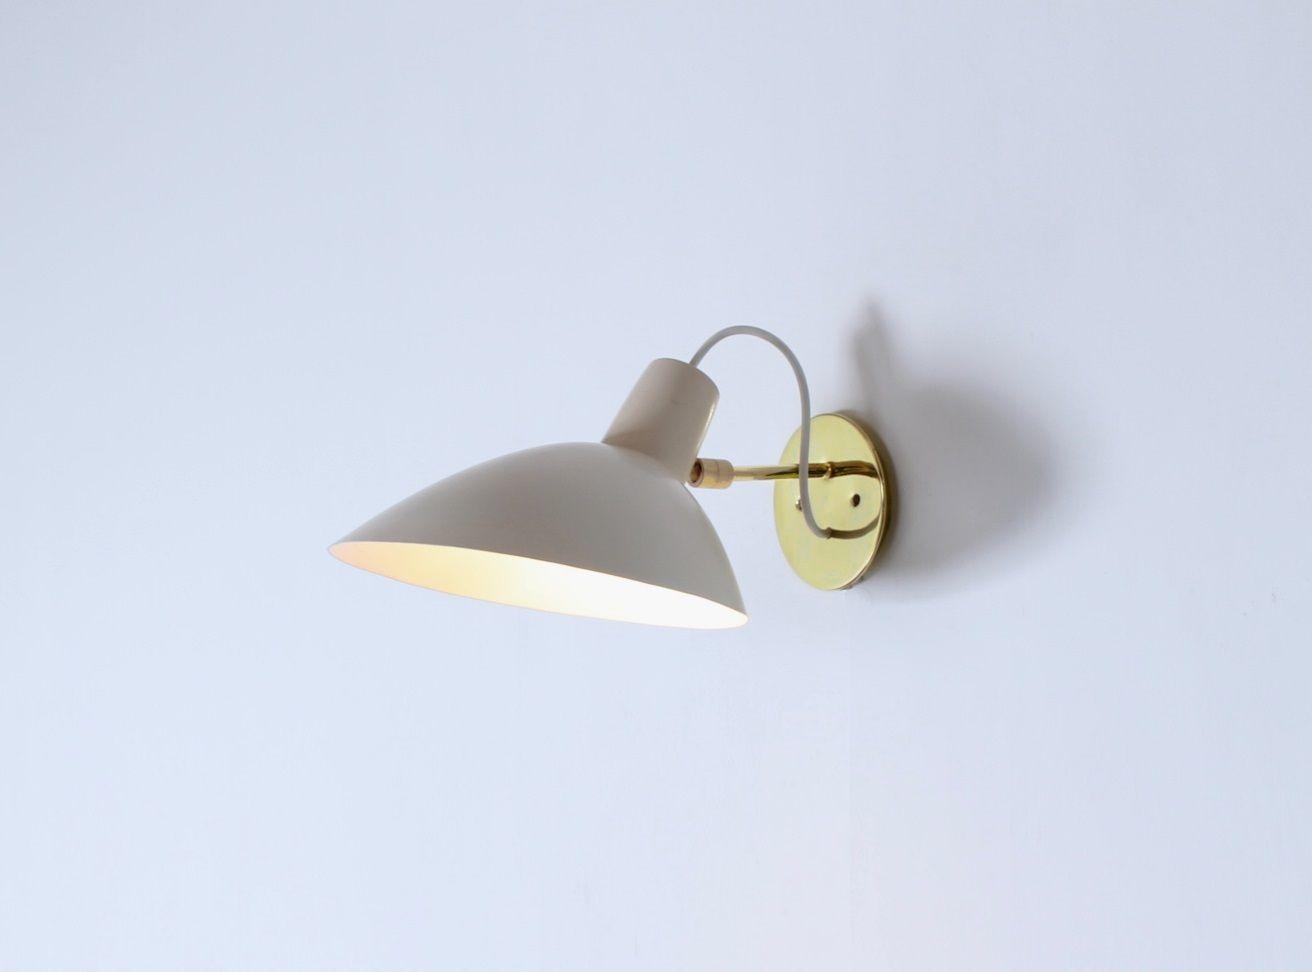 Design Wandleuchten Wohnzimmer Wandleuchten Mit Schalter Wandleuchten Bad Design Edelstahl Wandleuchte Wandlampe Mit Zuleit Wandlampe Wandleuchte Lampe